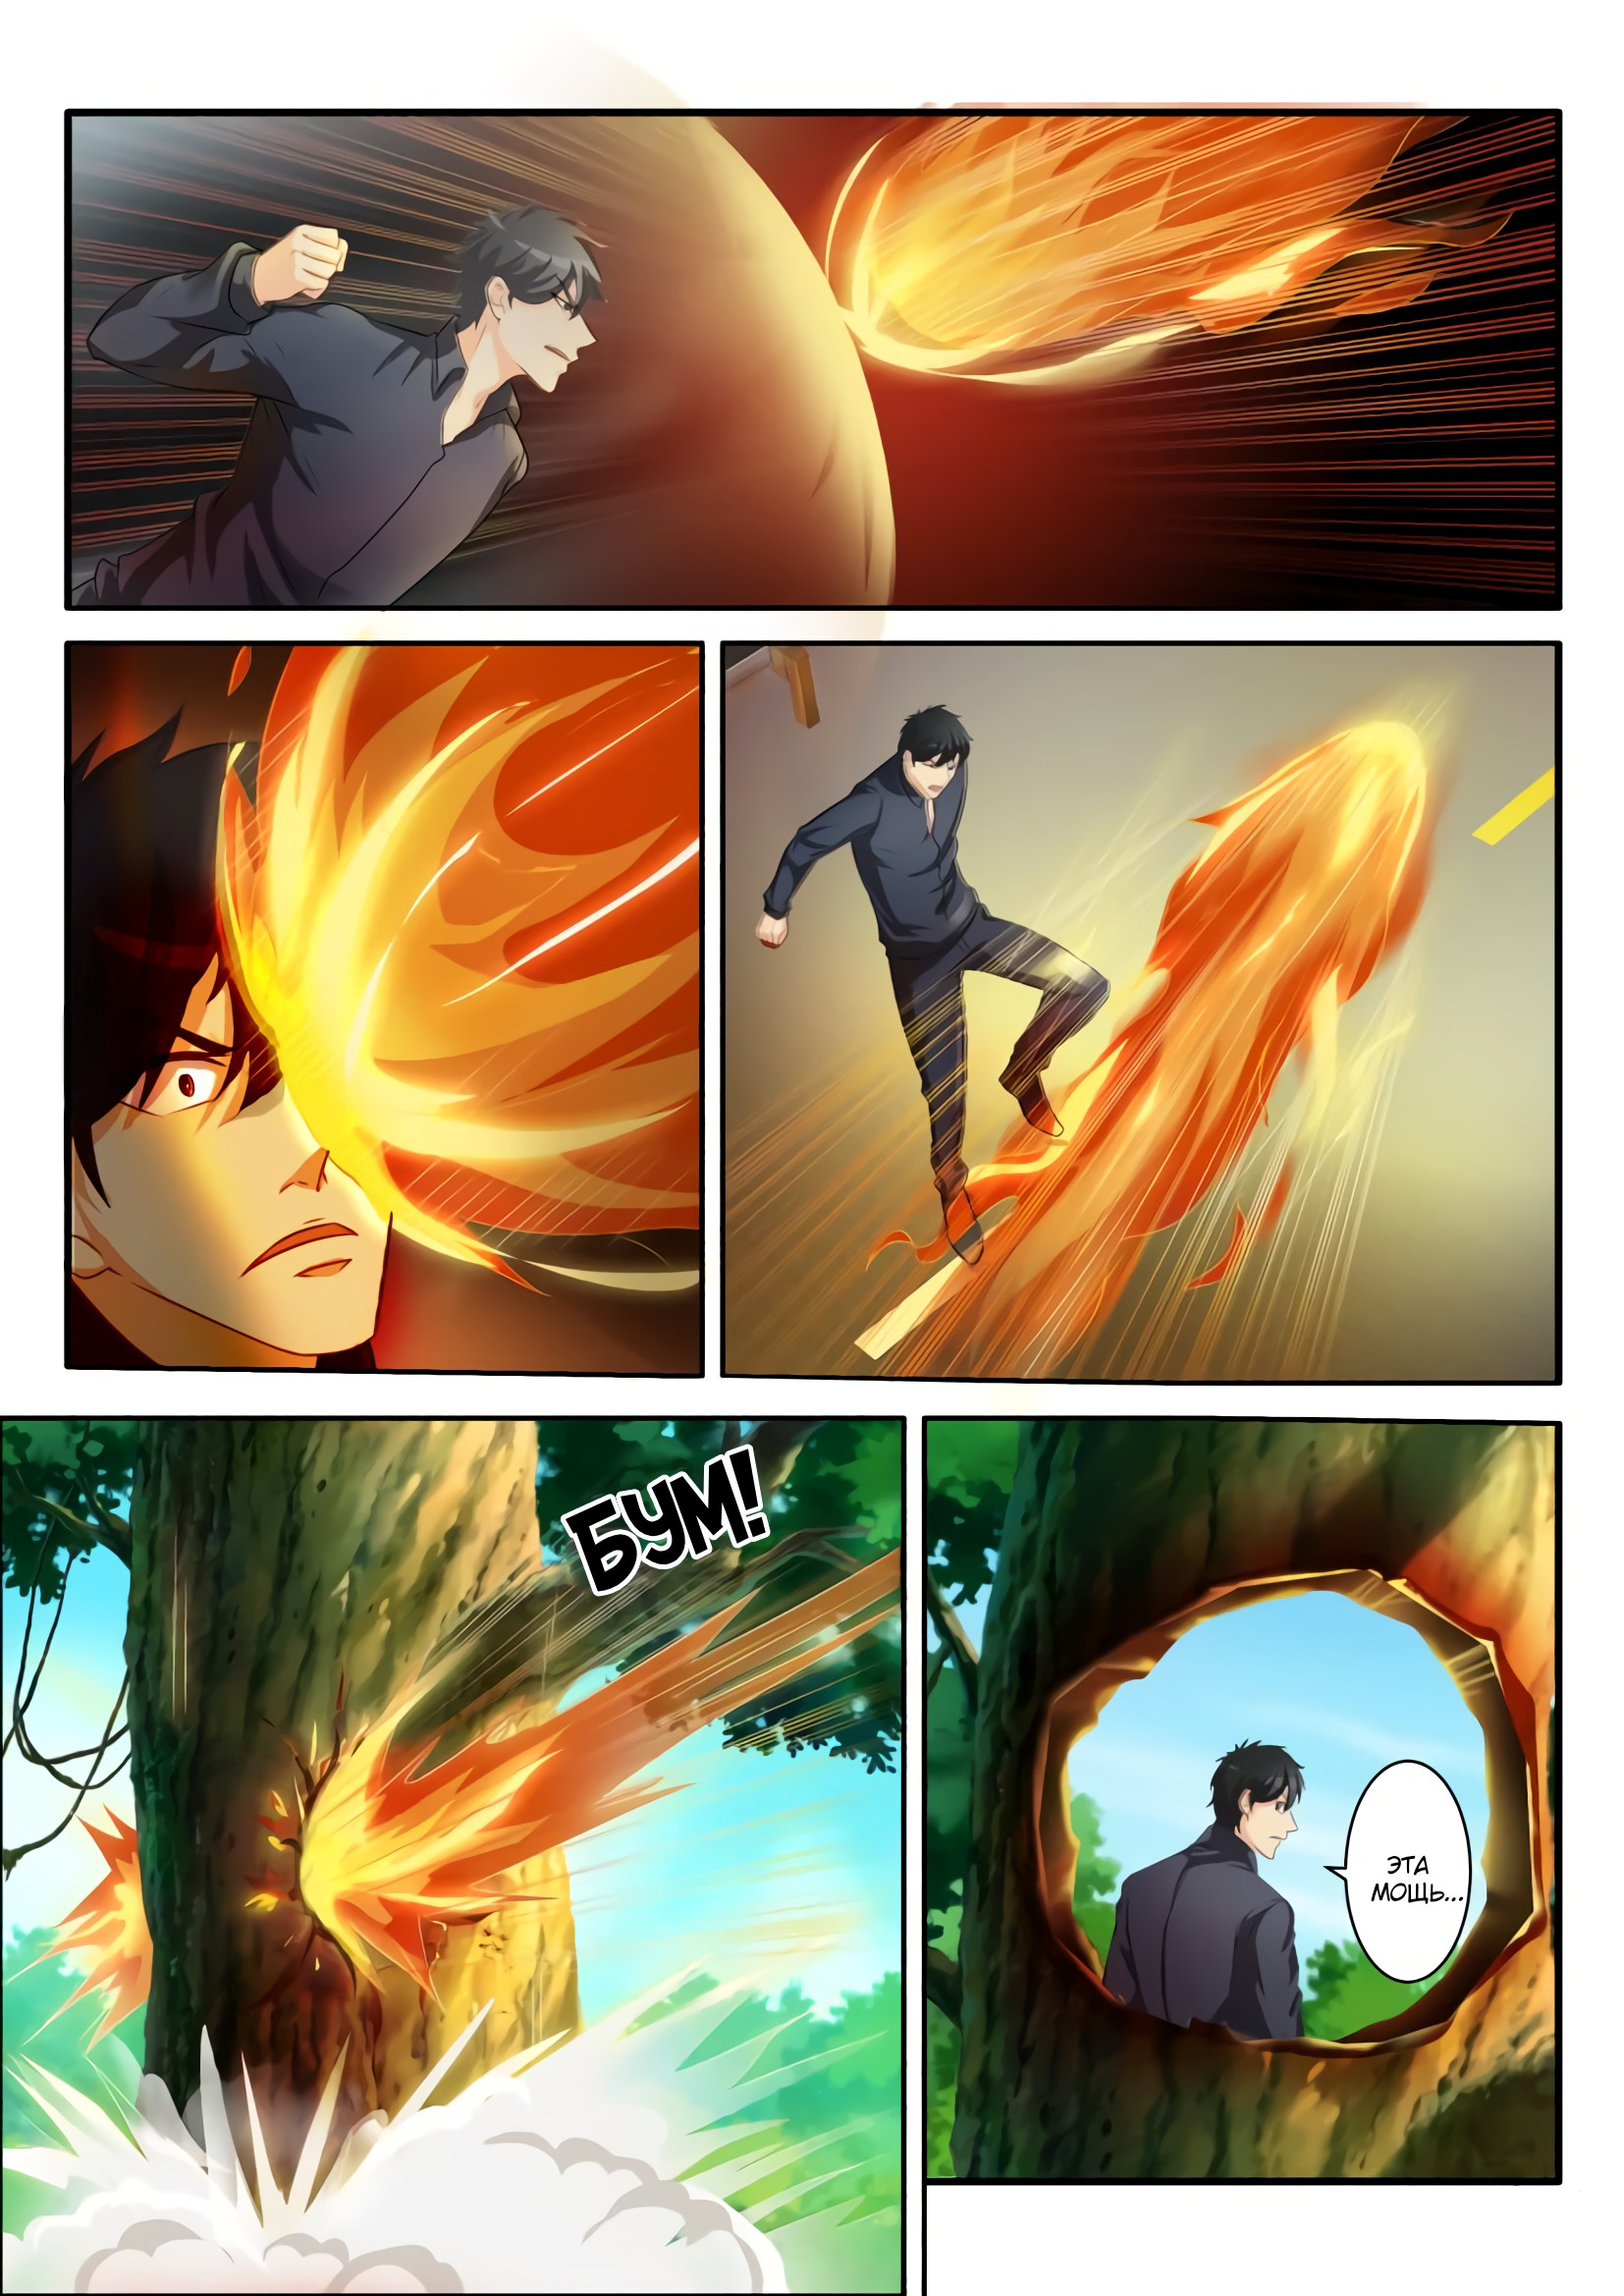 https://r2.ninemanga.com/comics/pic5/40/37032/1464904/1564142238945.jpg Page 9